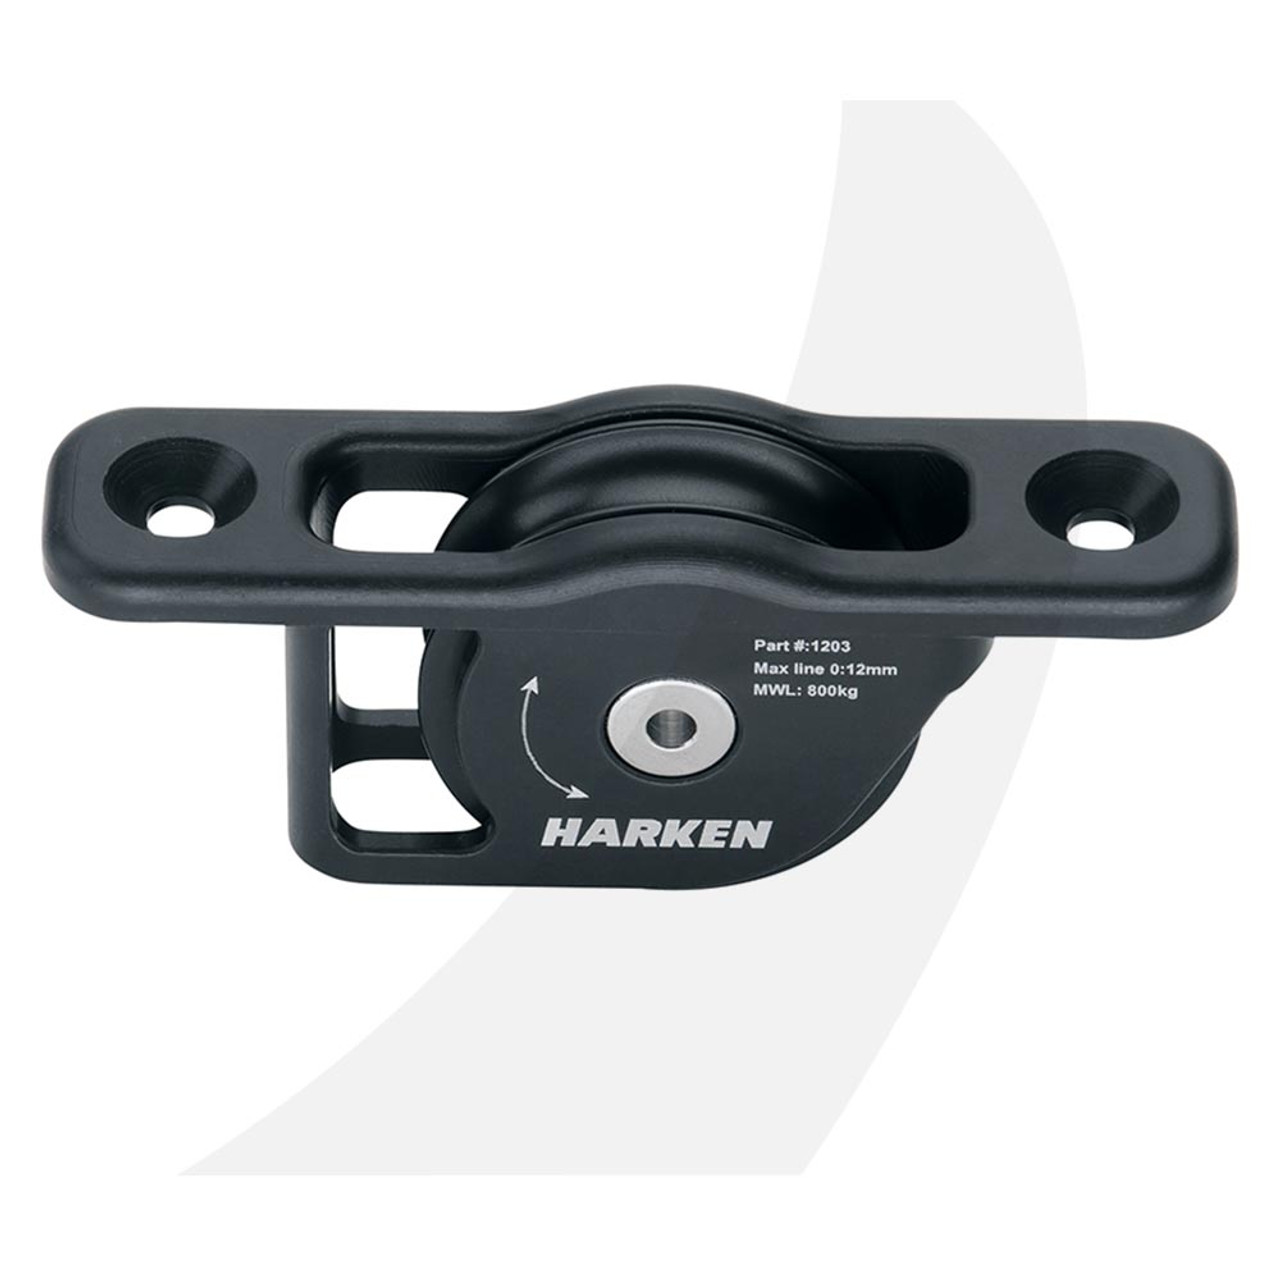 Harken 18 mm Fly™ Soft-Attach Block sailing dinghy keelboat hardware